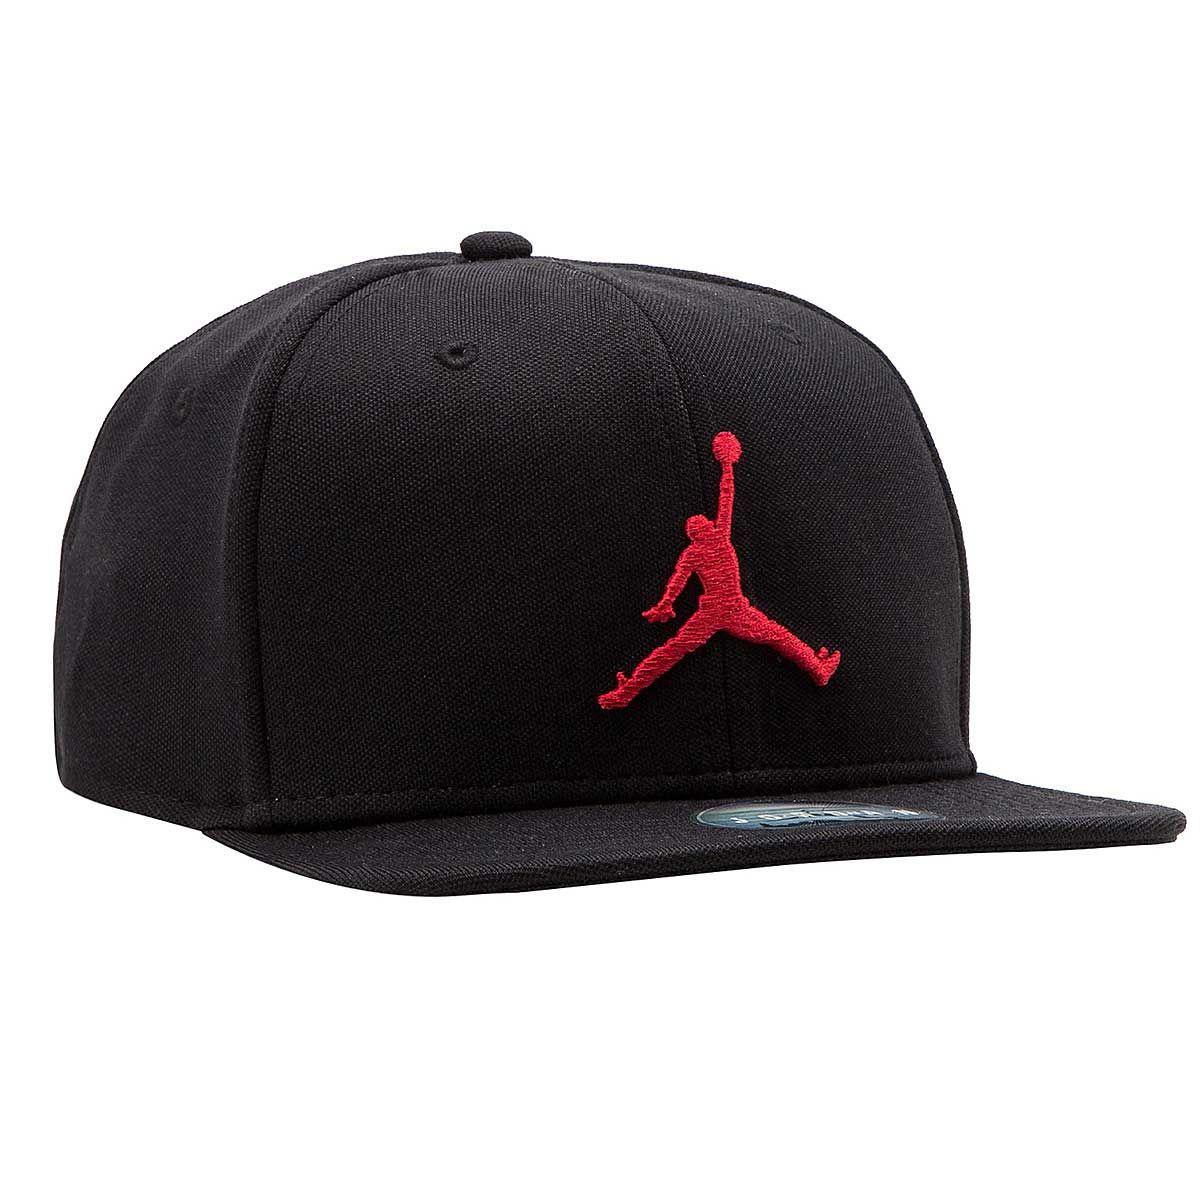 83dfecaf6c65 JORDAN JUMPMAN Snapback Cap BLACK GYM RED